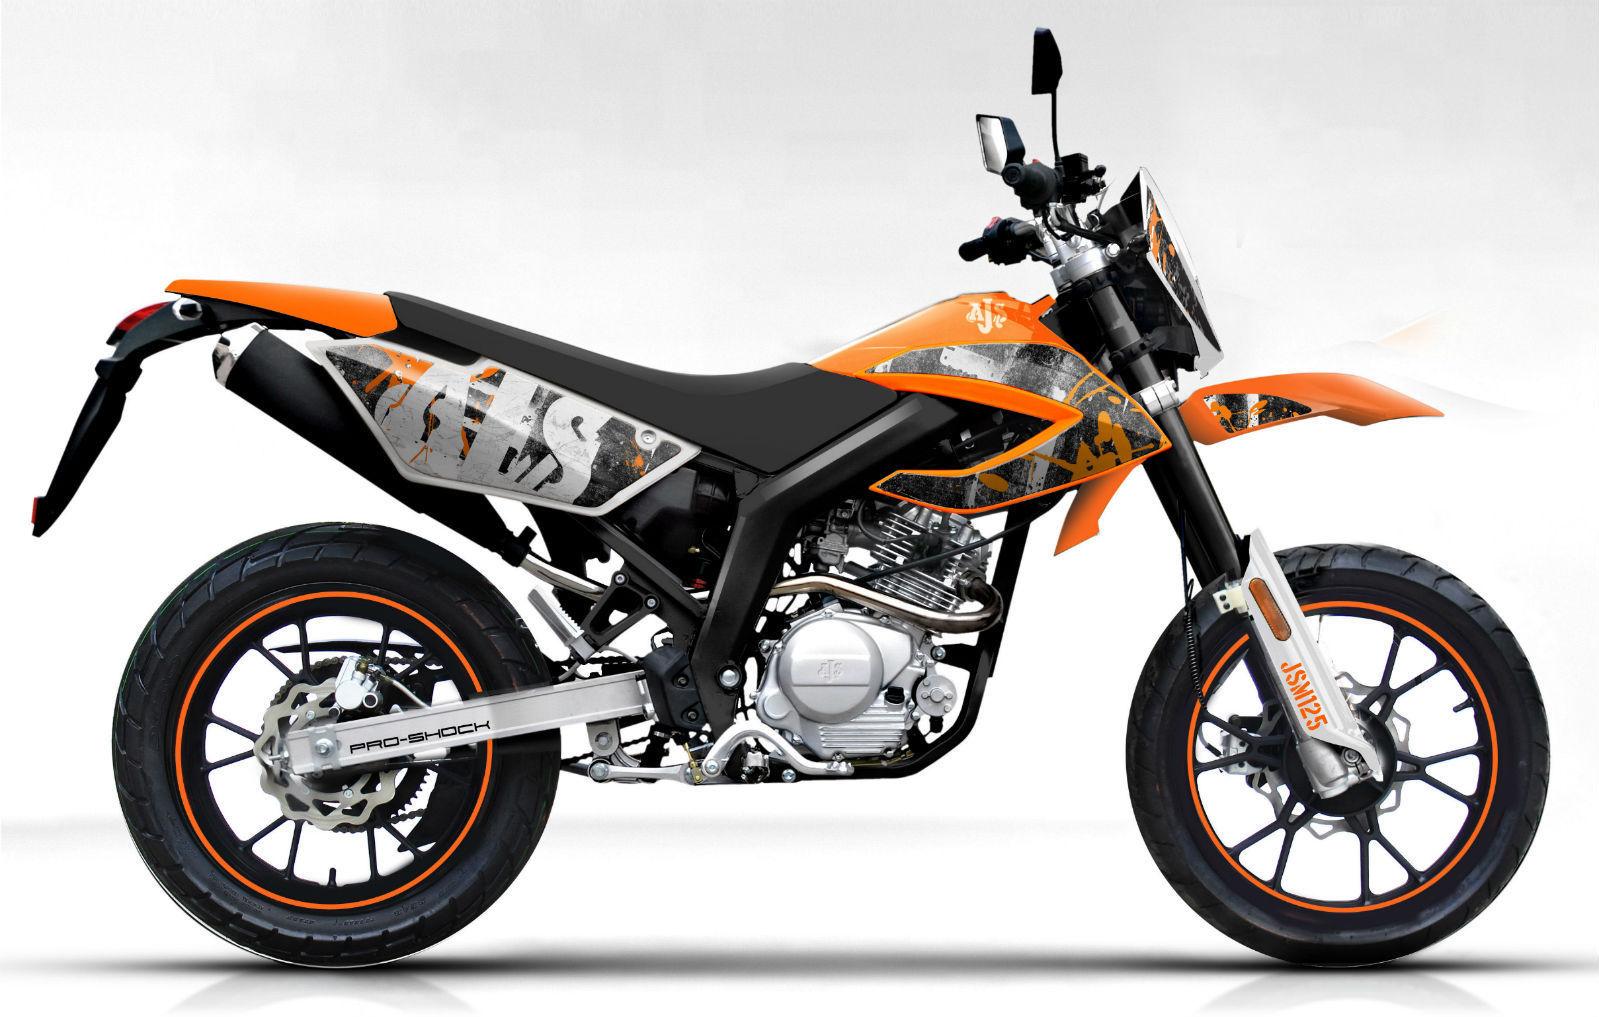 brand new ajs jsm 50 super moto 50cc motorcycle moped. Black Bedroom Furniture Sets. Home Design Ideas